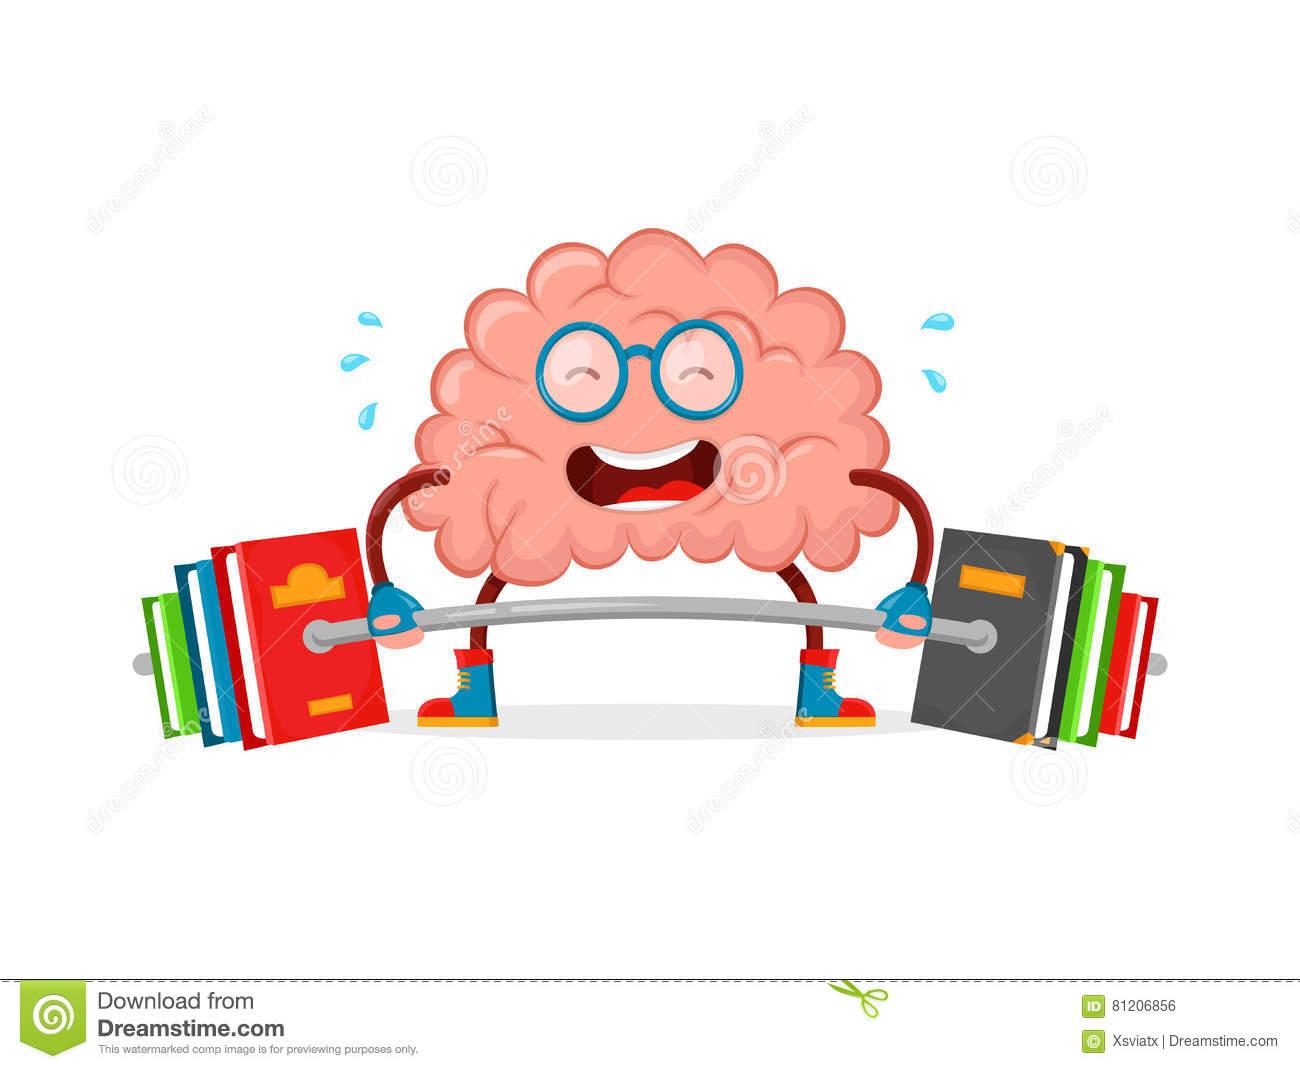 Train Your Brain. Brain Vector Cartoon Fla #103314.